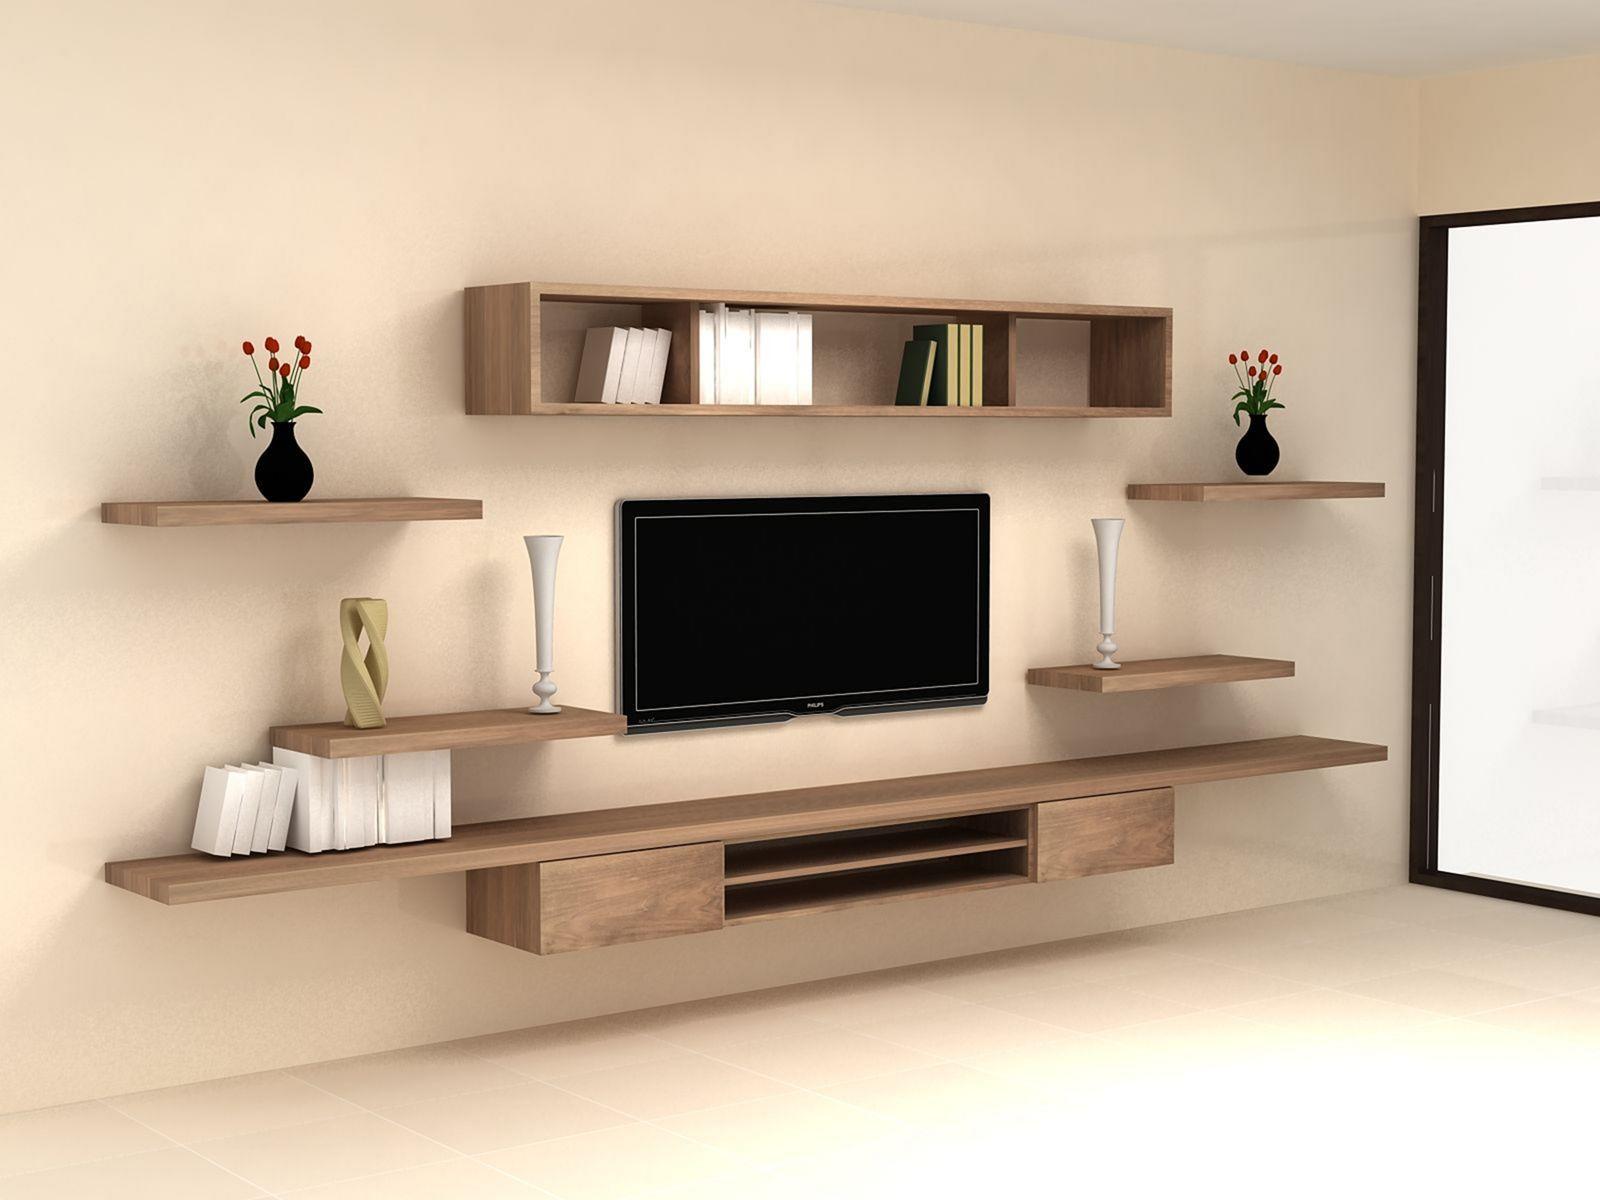 Tv Wall Cabinet Design